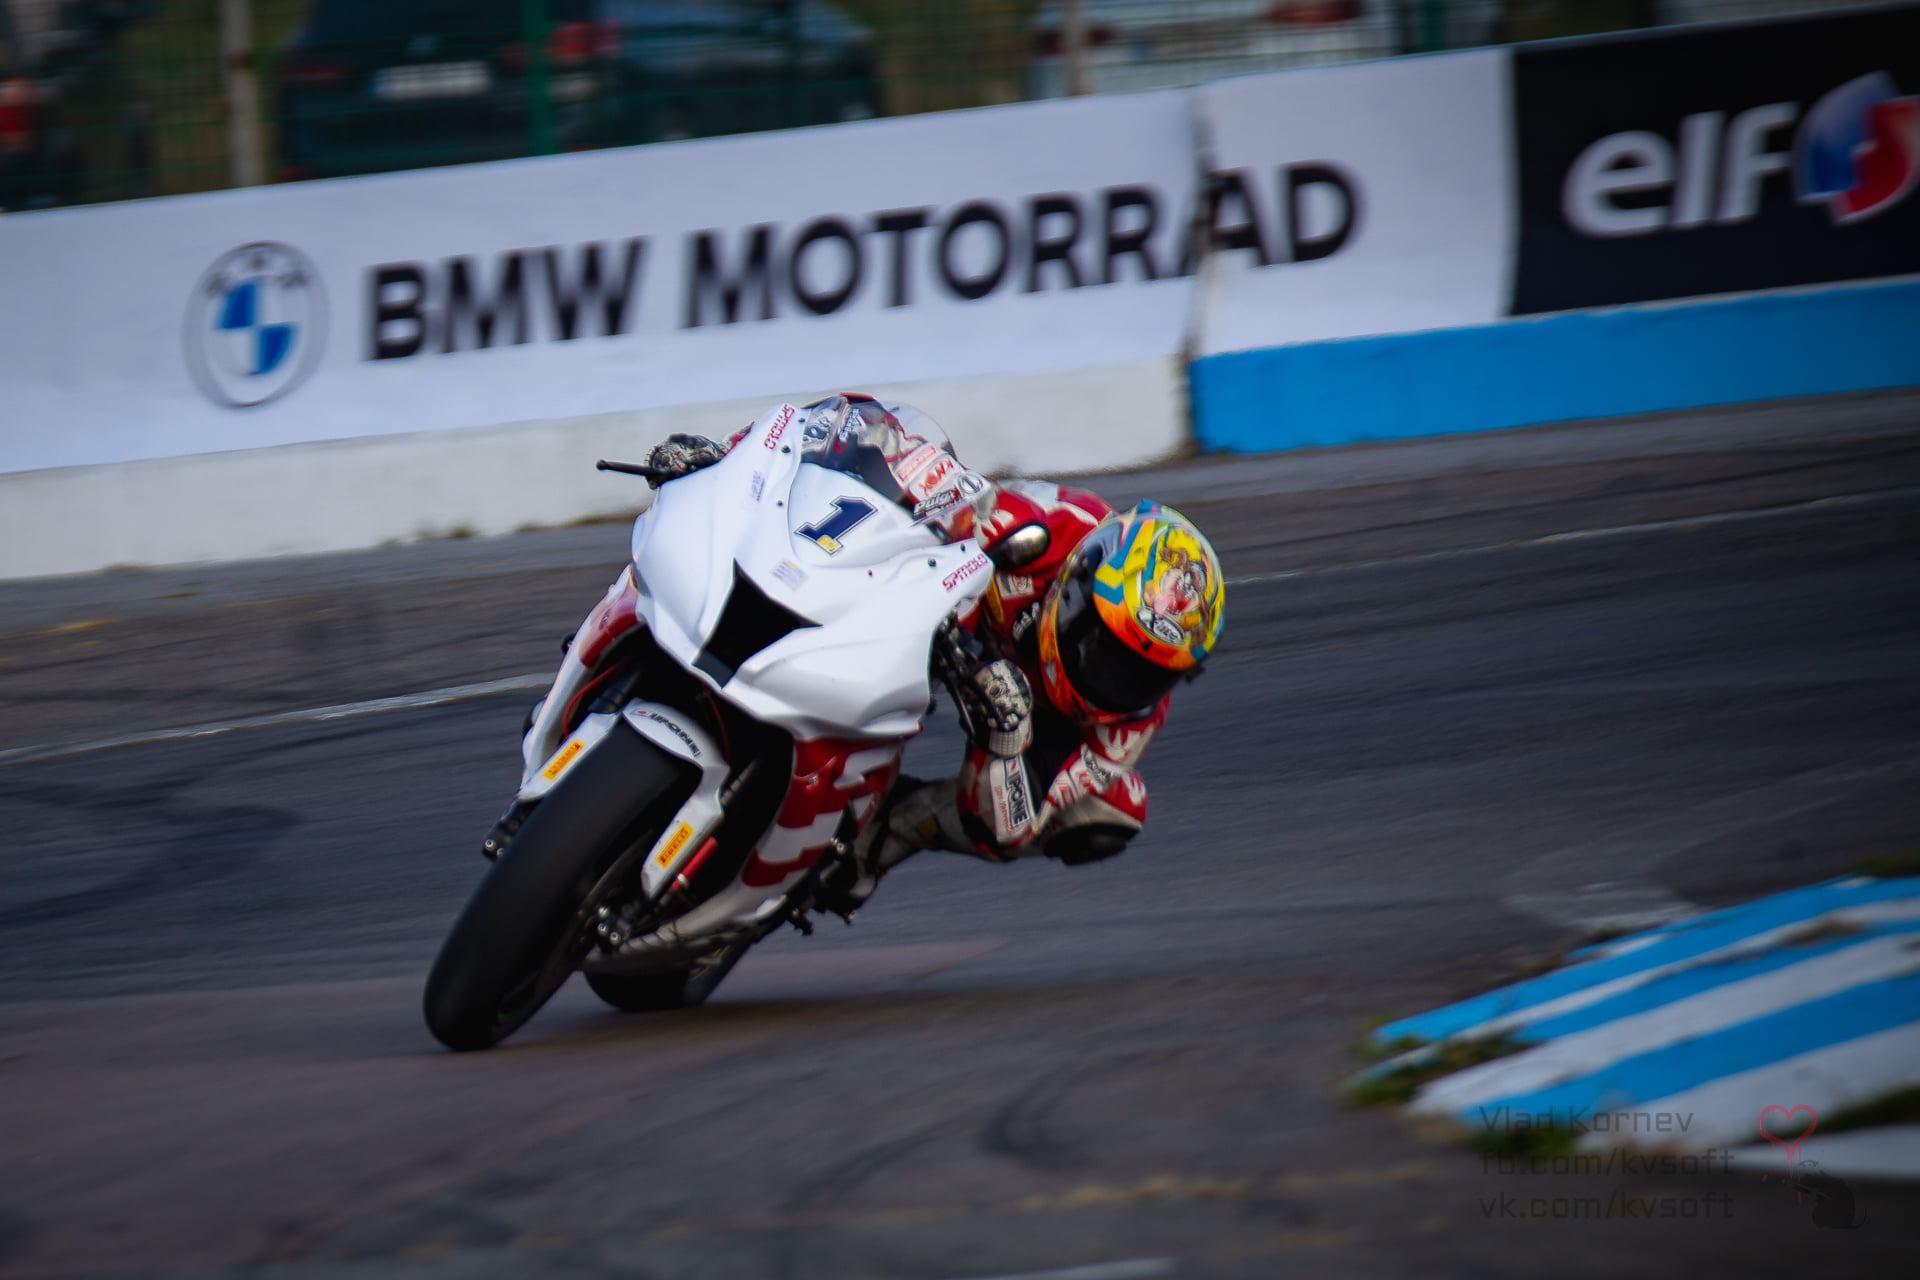 5-6_etap_MotoGPUkraine_006